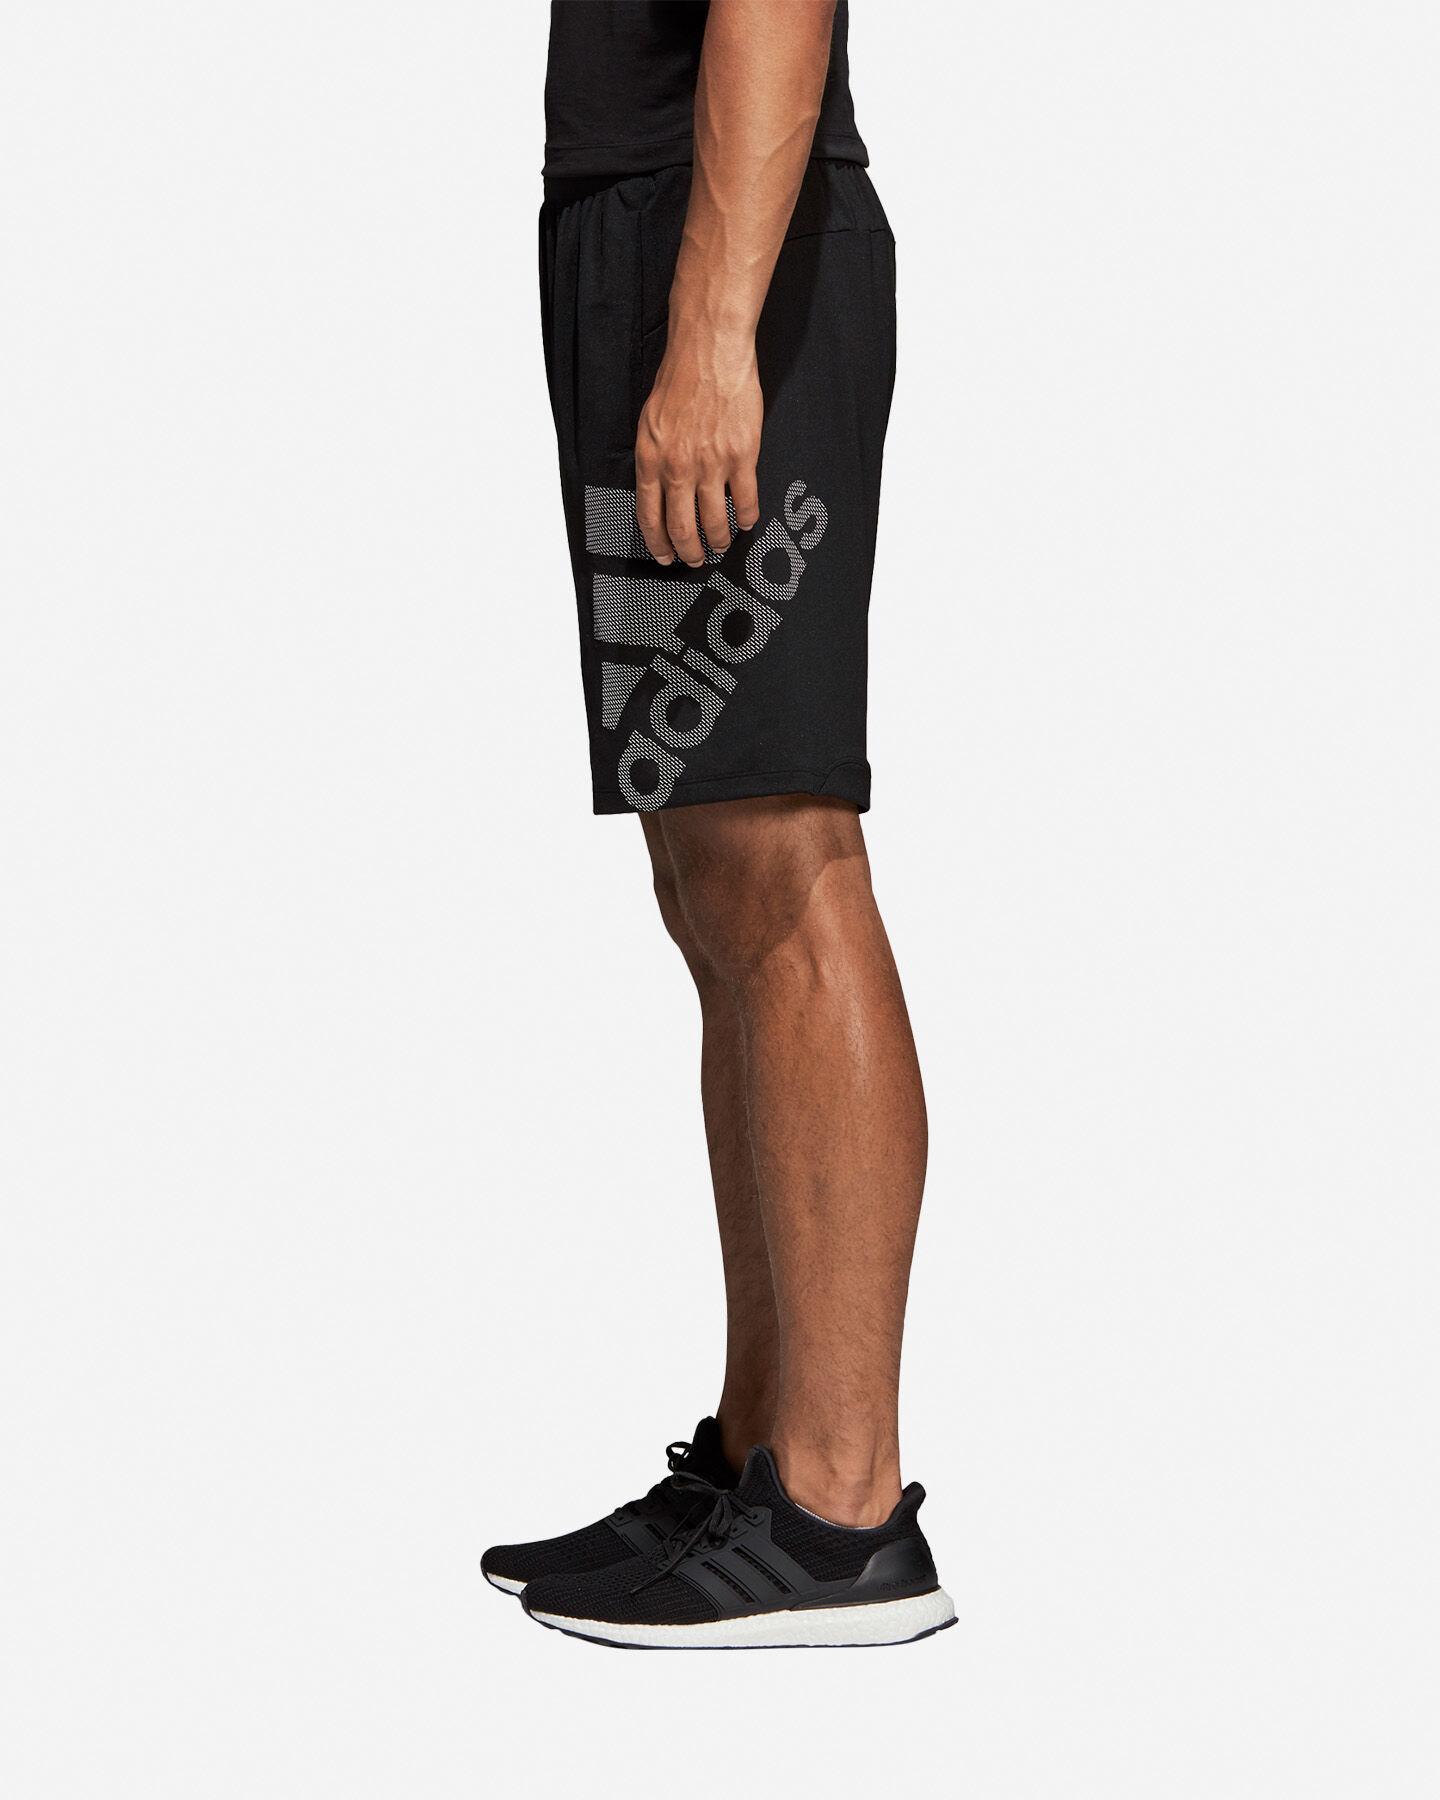 Pantalone training ADIDAS 4KRFT SPORT GRAPHIC BADGE OF SPORT M S2020483 scatto 3